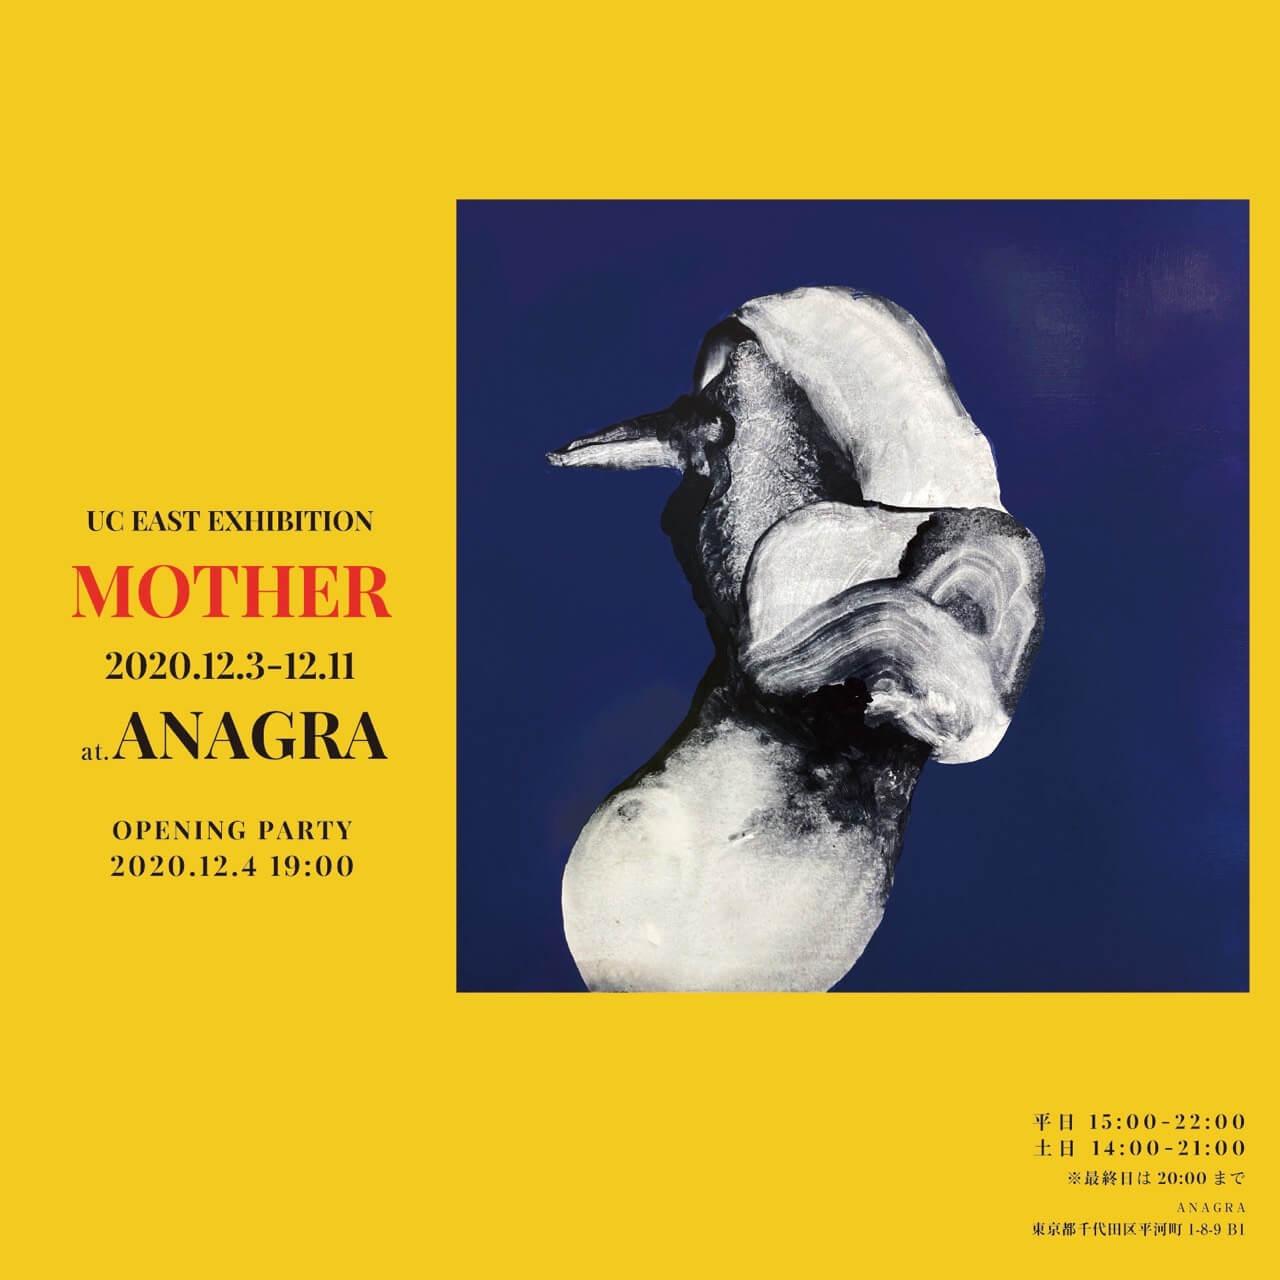 UC EASTの東京初個展「MOTHER」がANAGRAにて開催 オープニングパーティには¥ØU$UK€ ¥UK1MAT$U、Akie、Celterが出演 art-culture201202-uceast-anagra-2